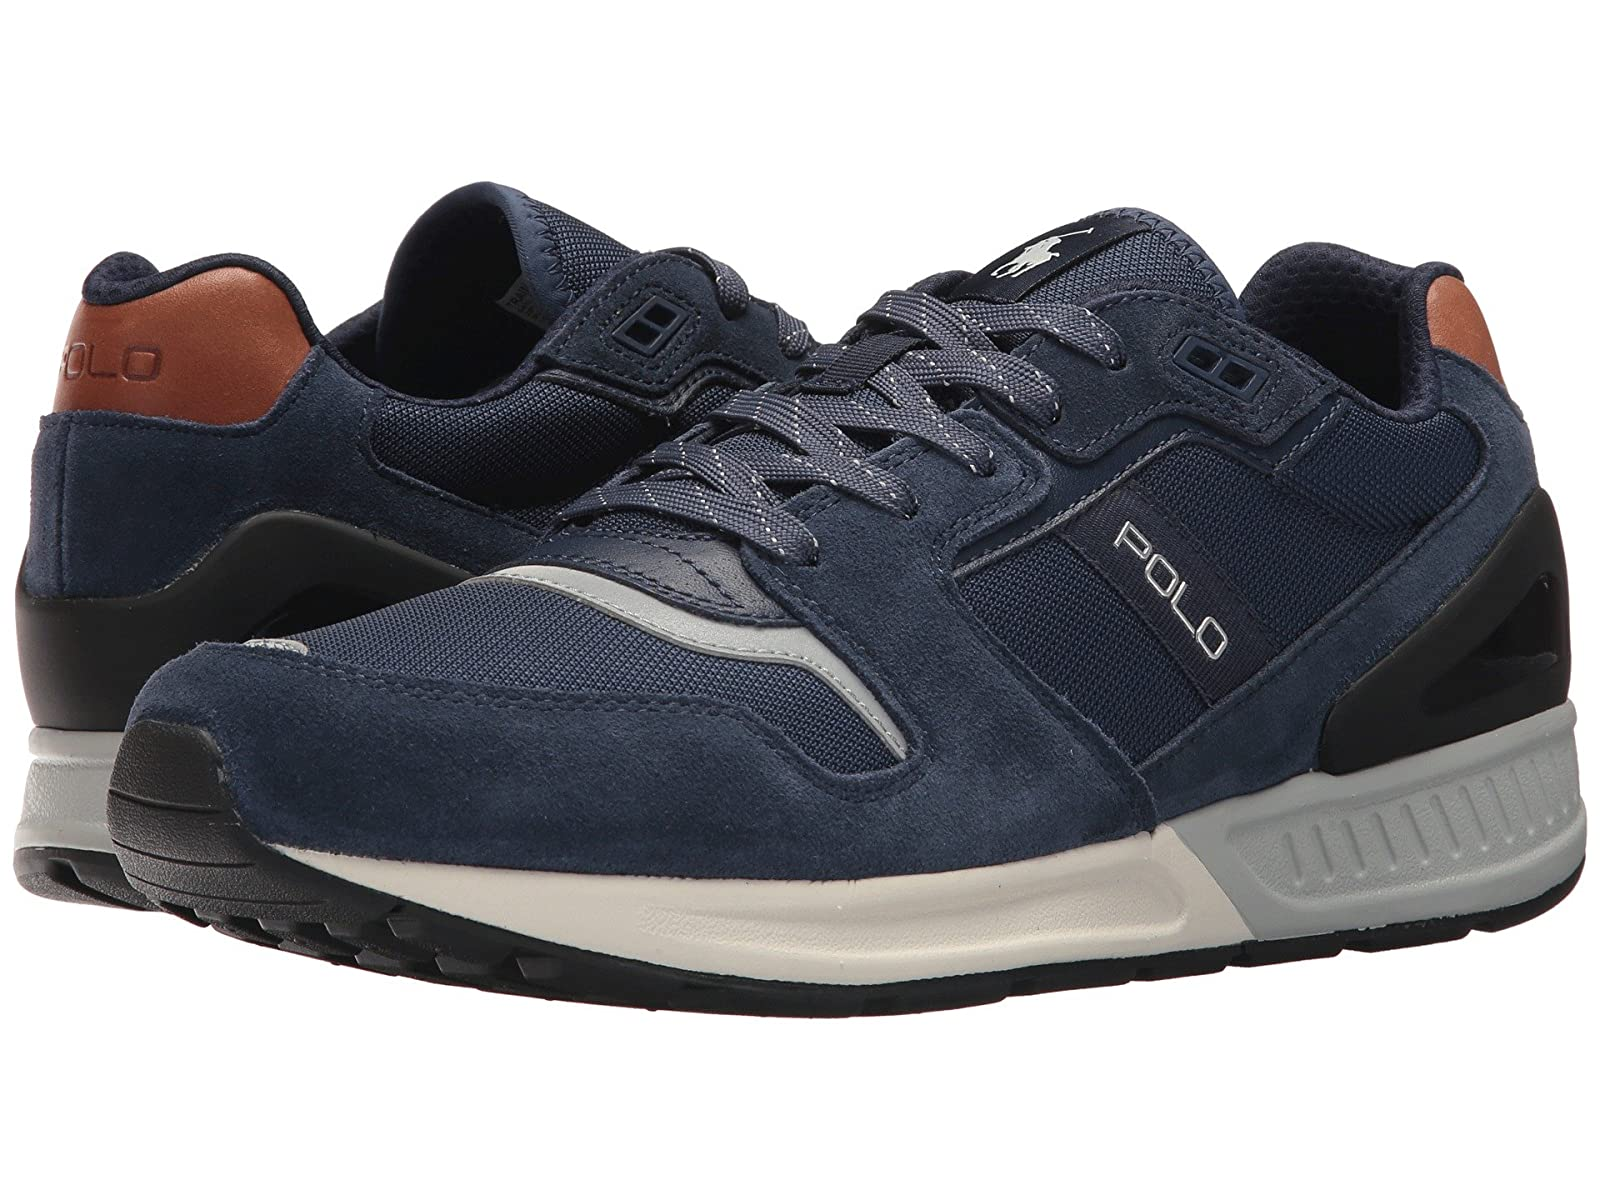 Polo Ralph Lauren Train 100Cheap and distinctive eye-catching shoes